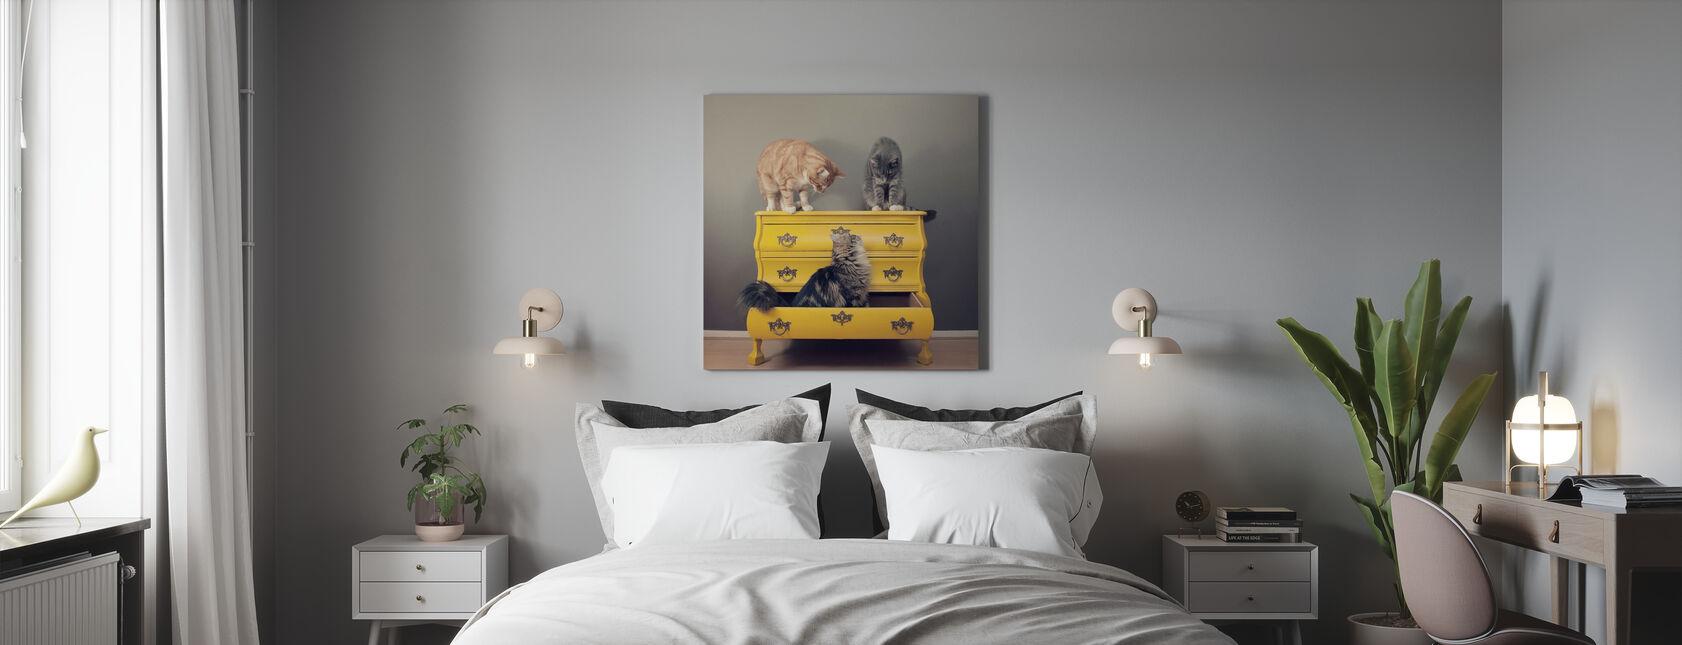 Möte i en gul byrå - Canvastavla - Sovrum